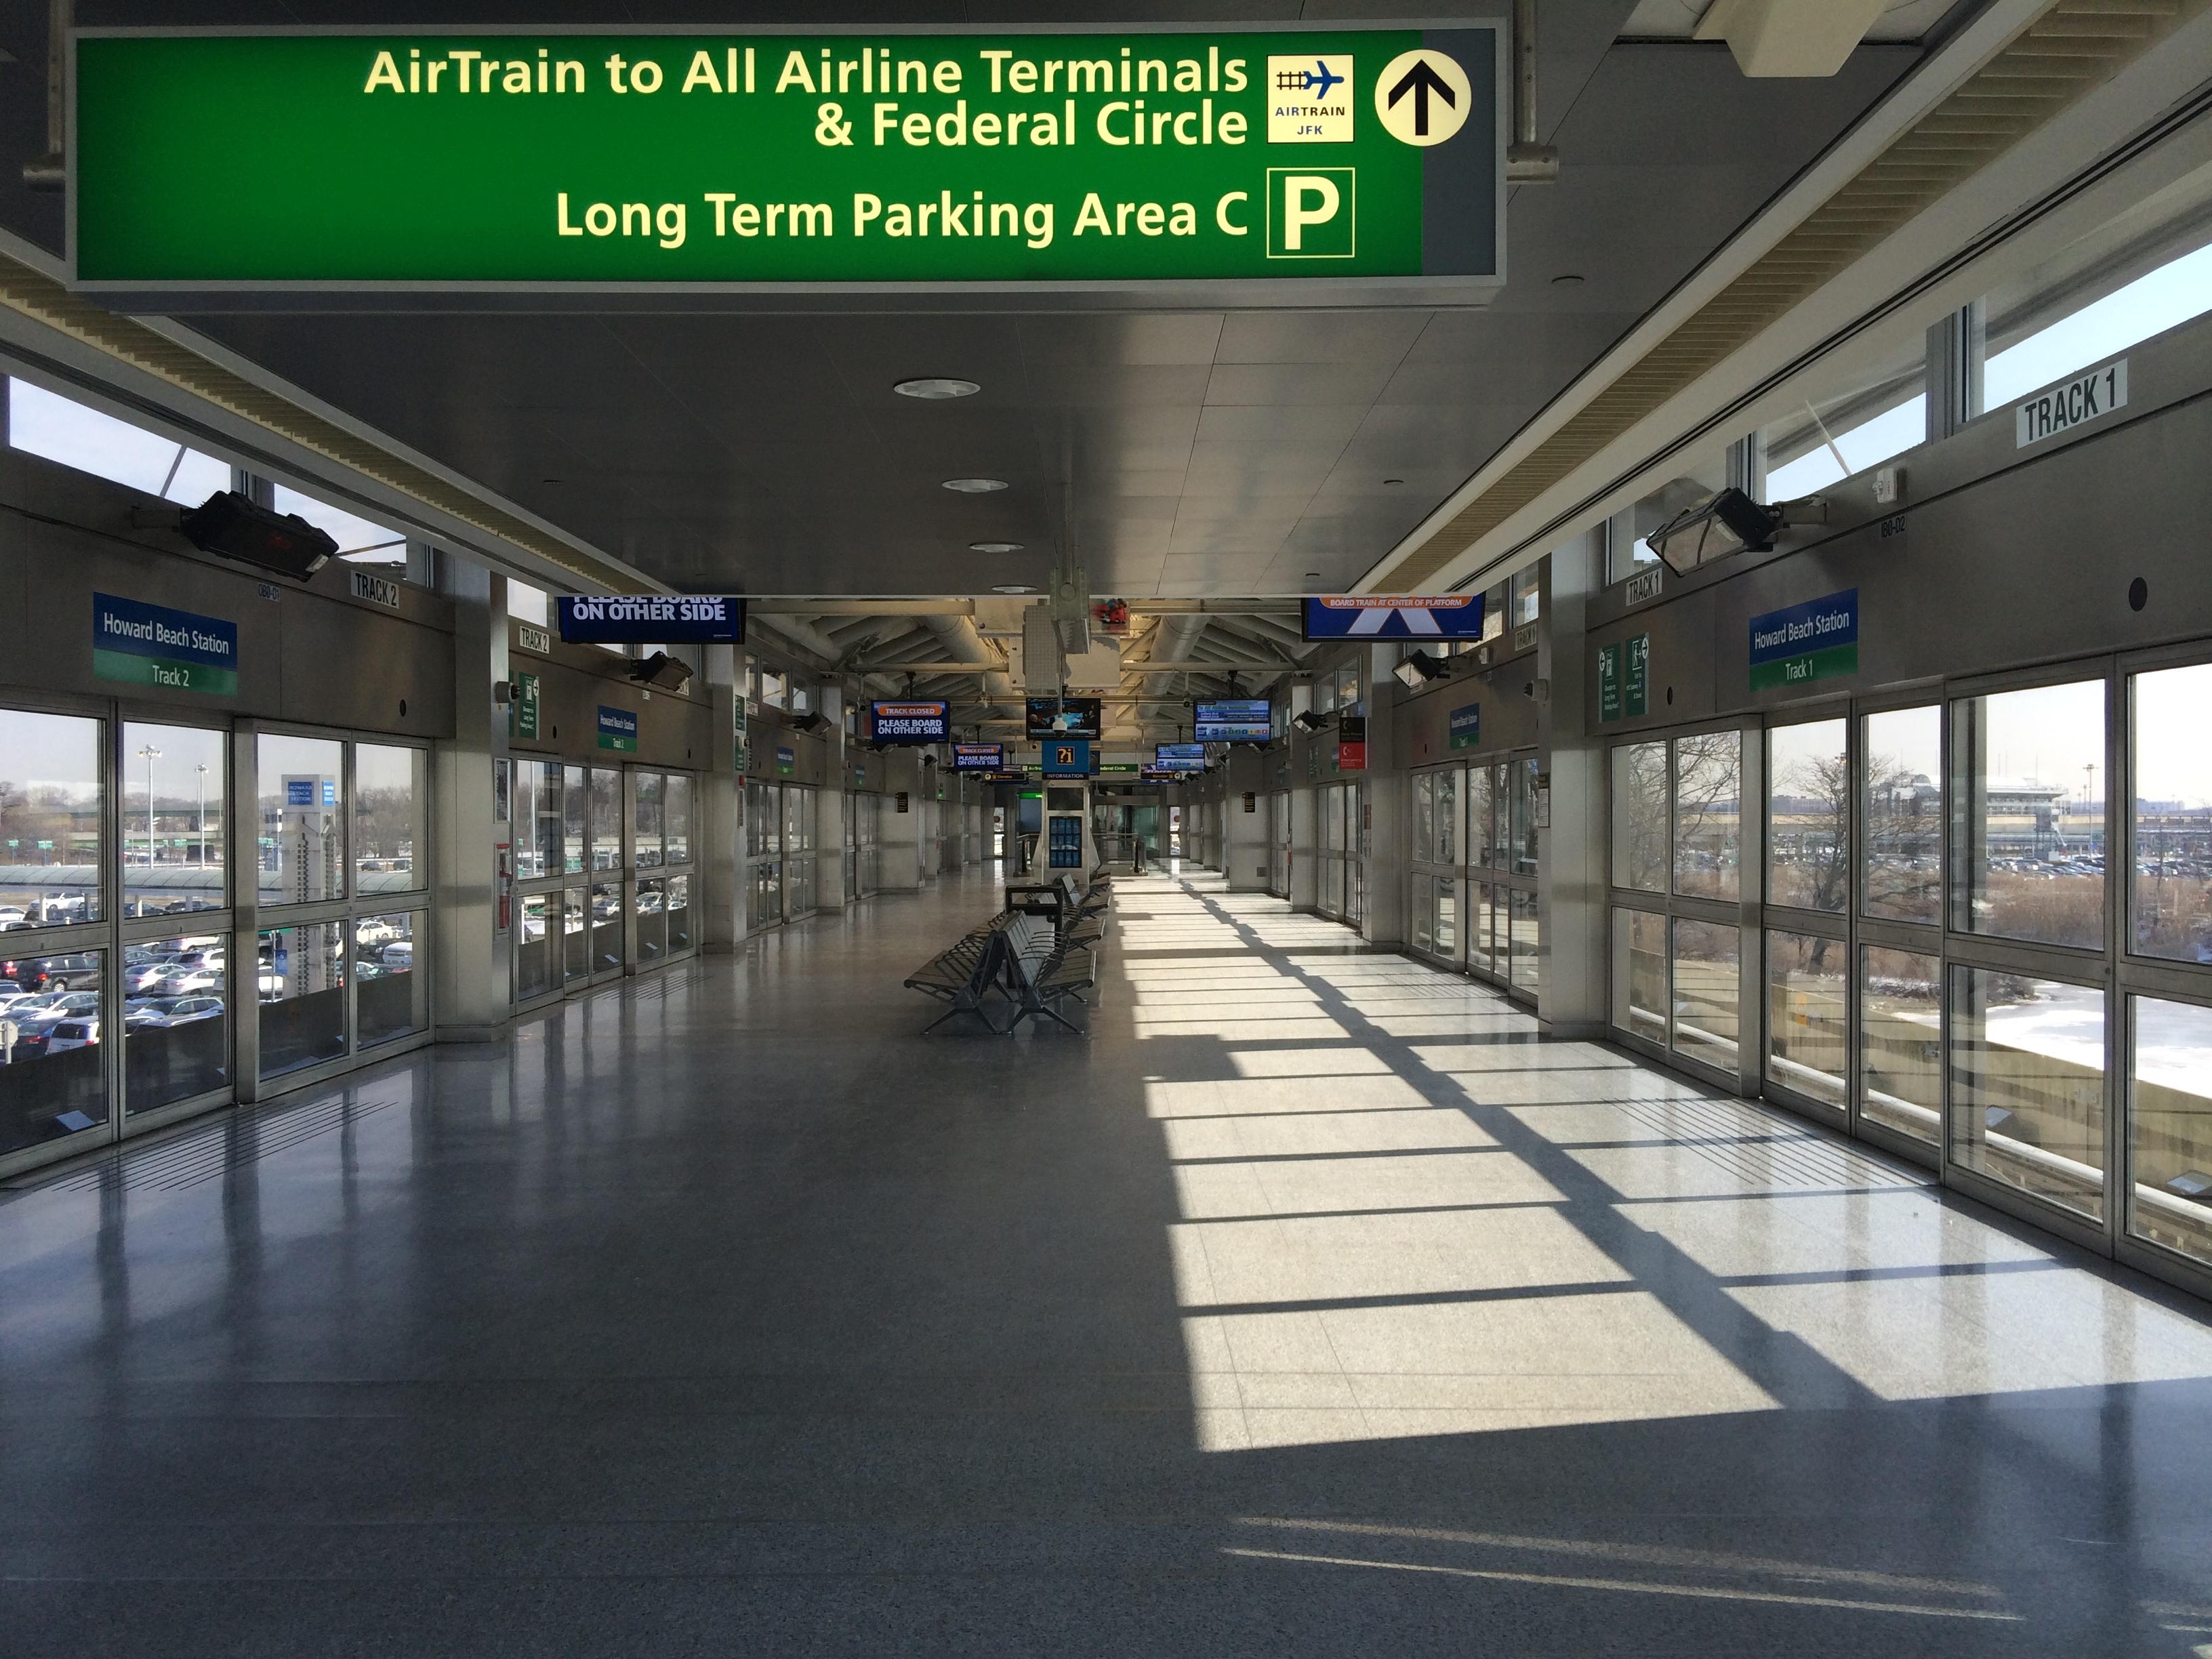 [*O/JL] AA8402/JL005 2015/3/8 JFK-NRT 飛行紀錄 | Travel in Life